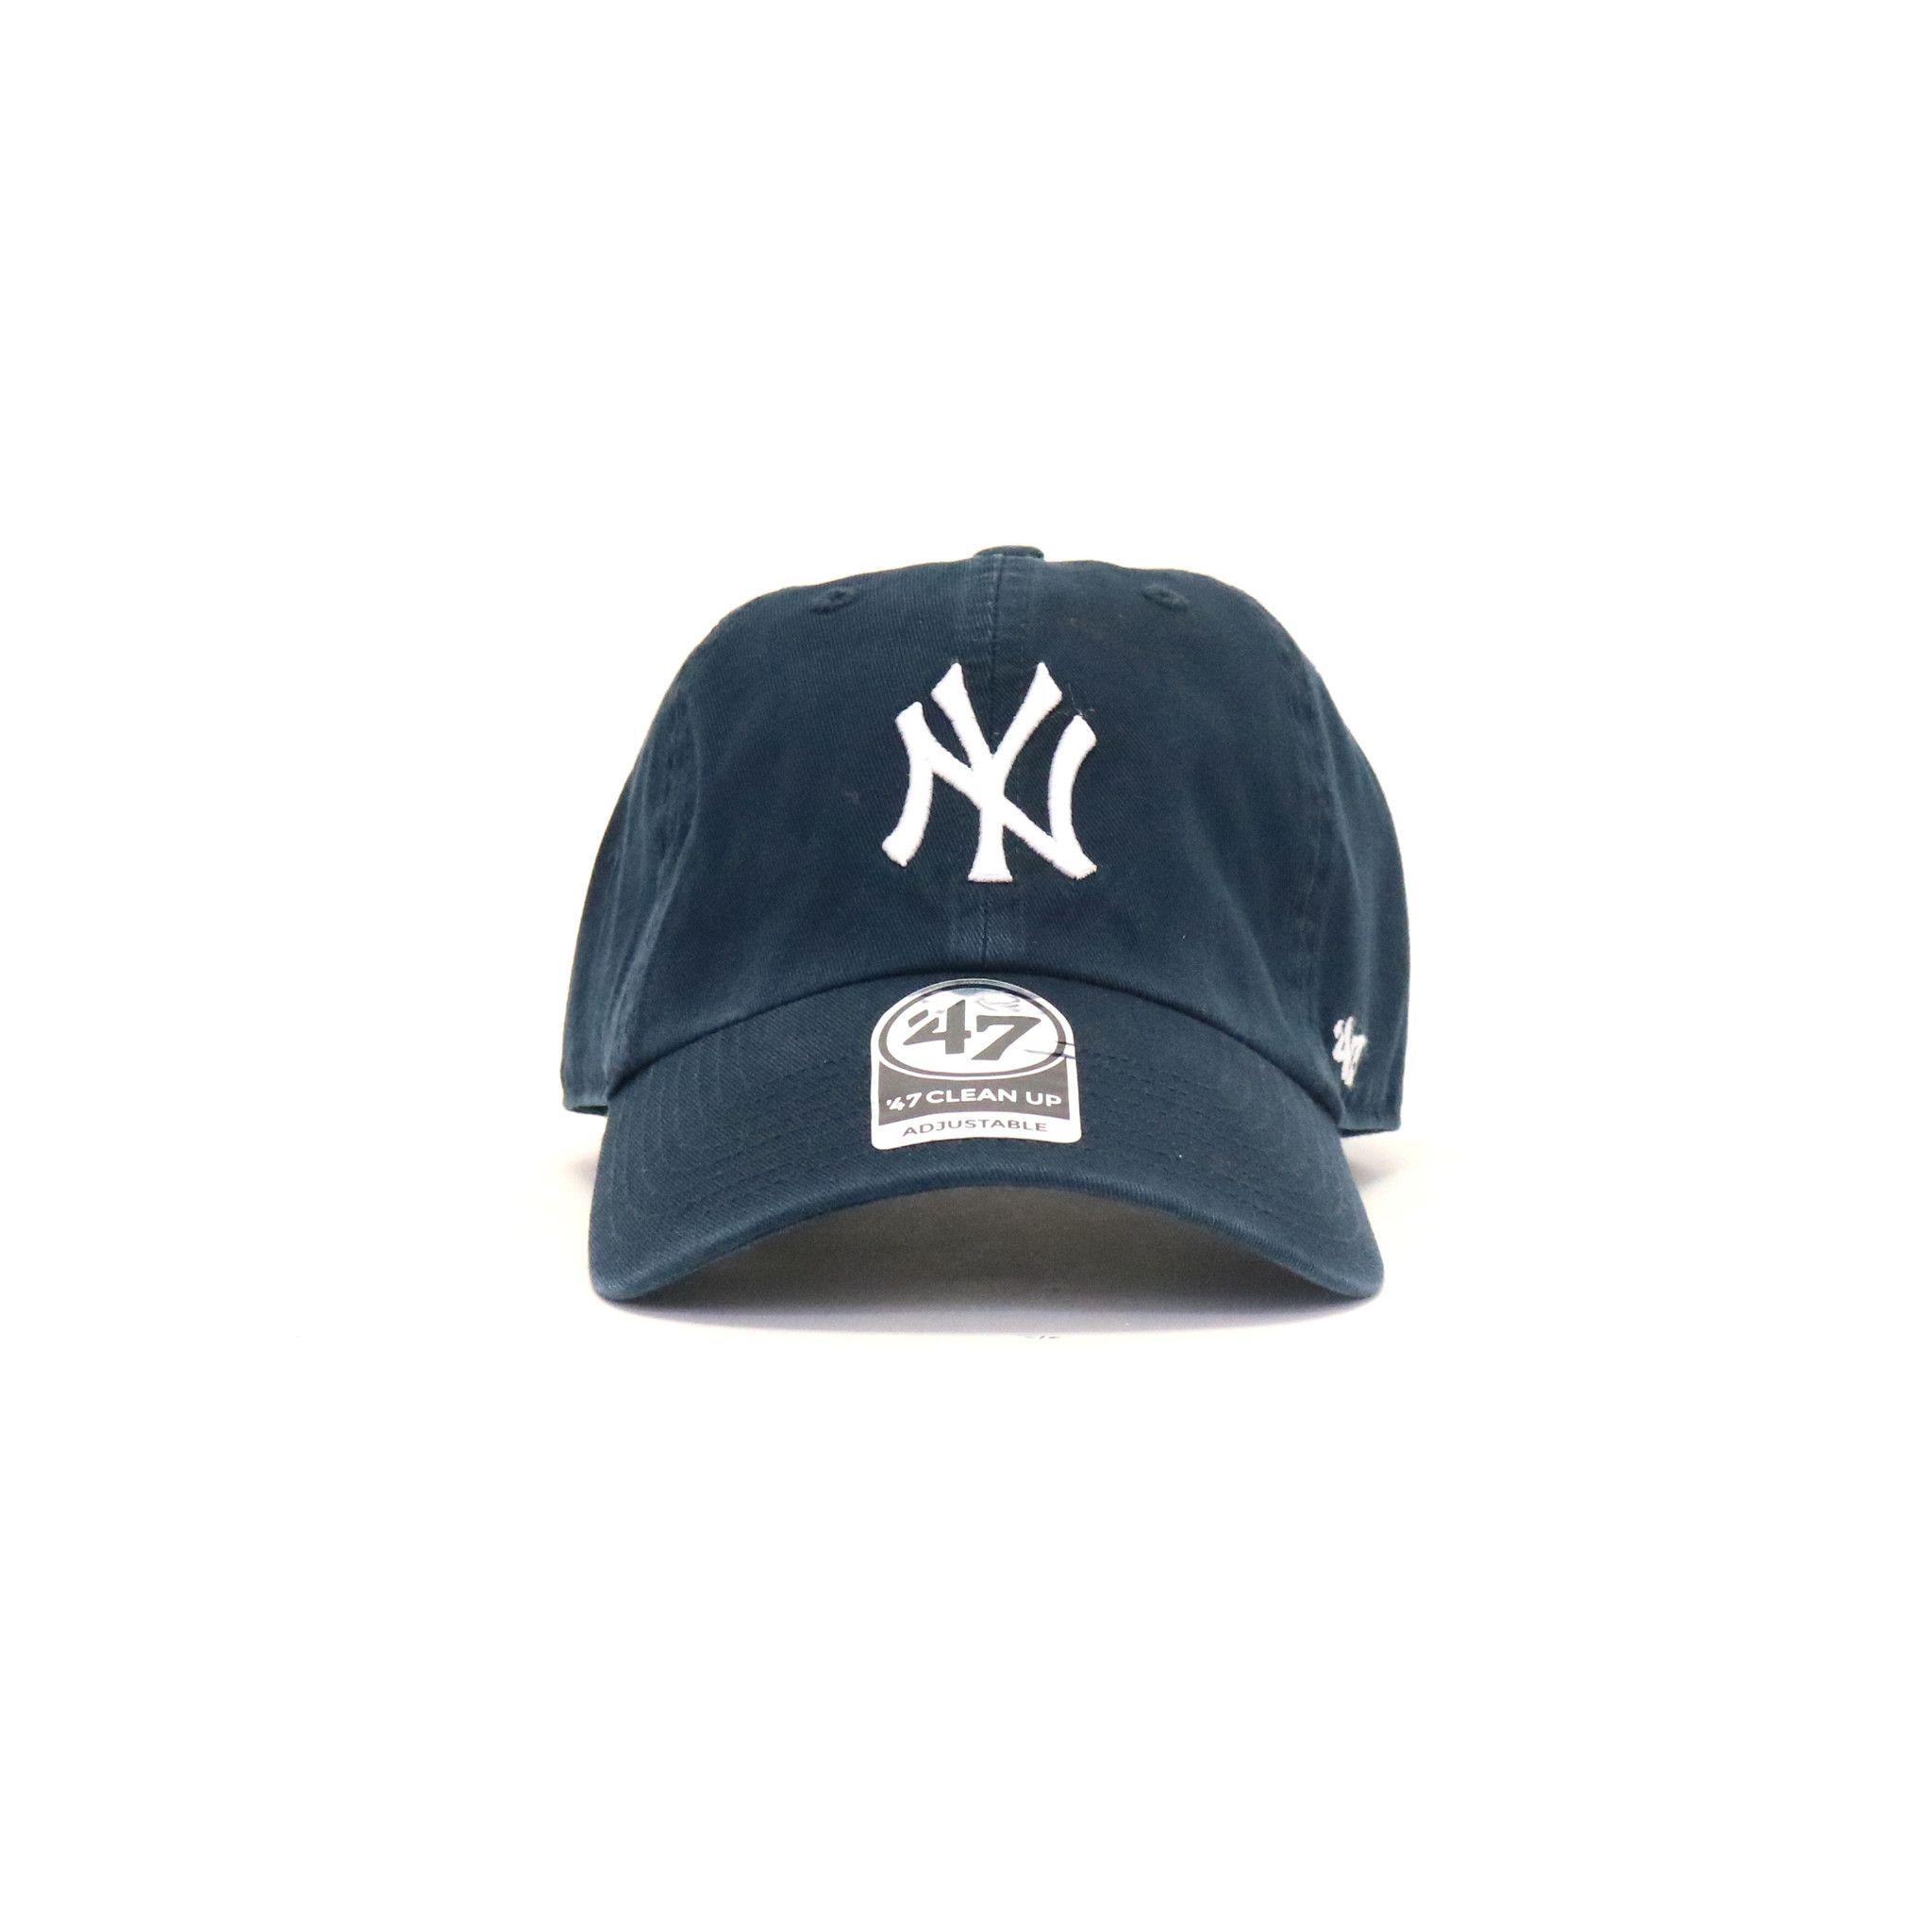 size 40 236d0 5e054 new york yankees womens mlb nike white 3.0 stadium hat 23.99  new york  yankees clean up home strapback dad hat navy ...